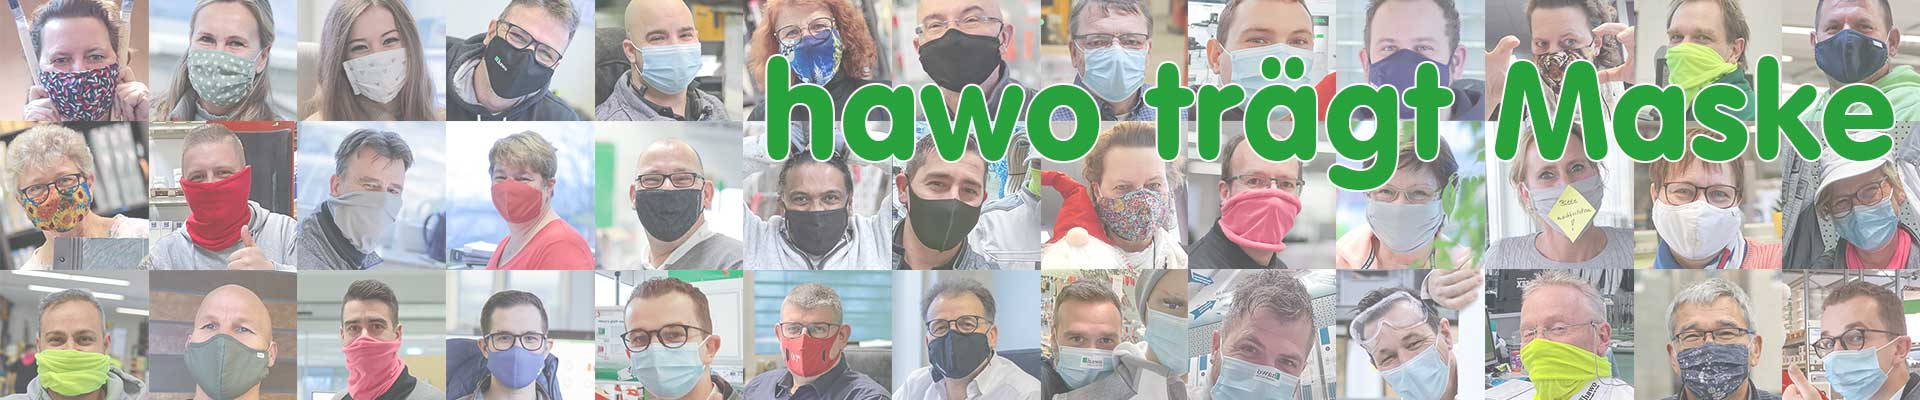 hawo trägt Maske